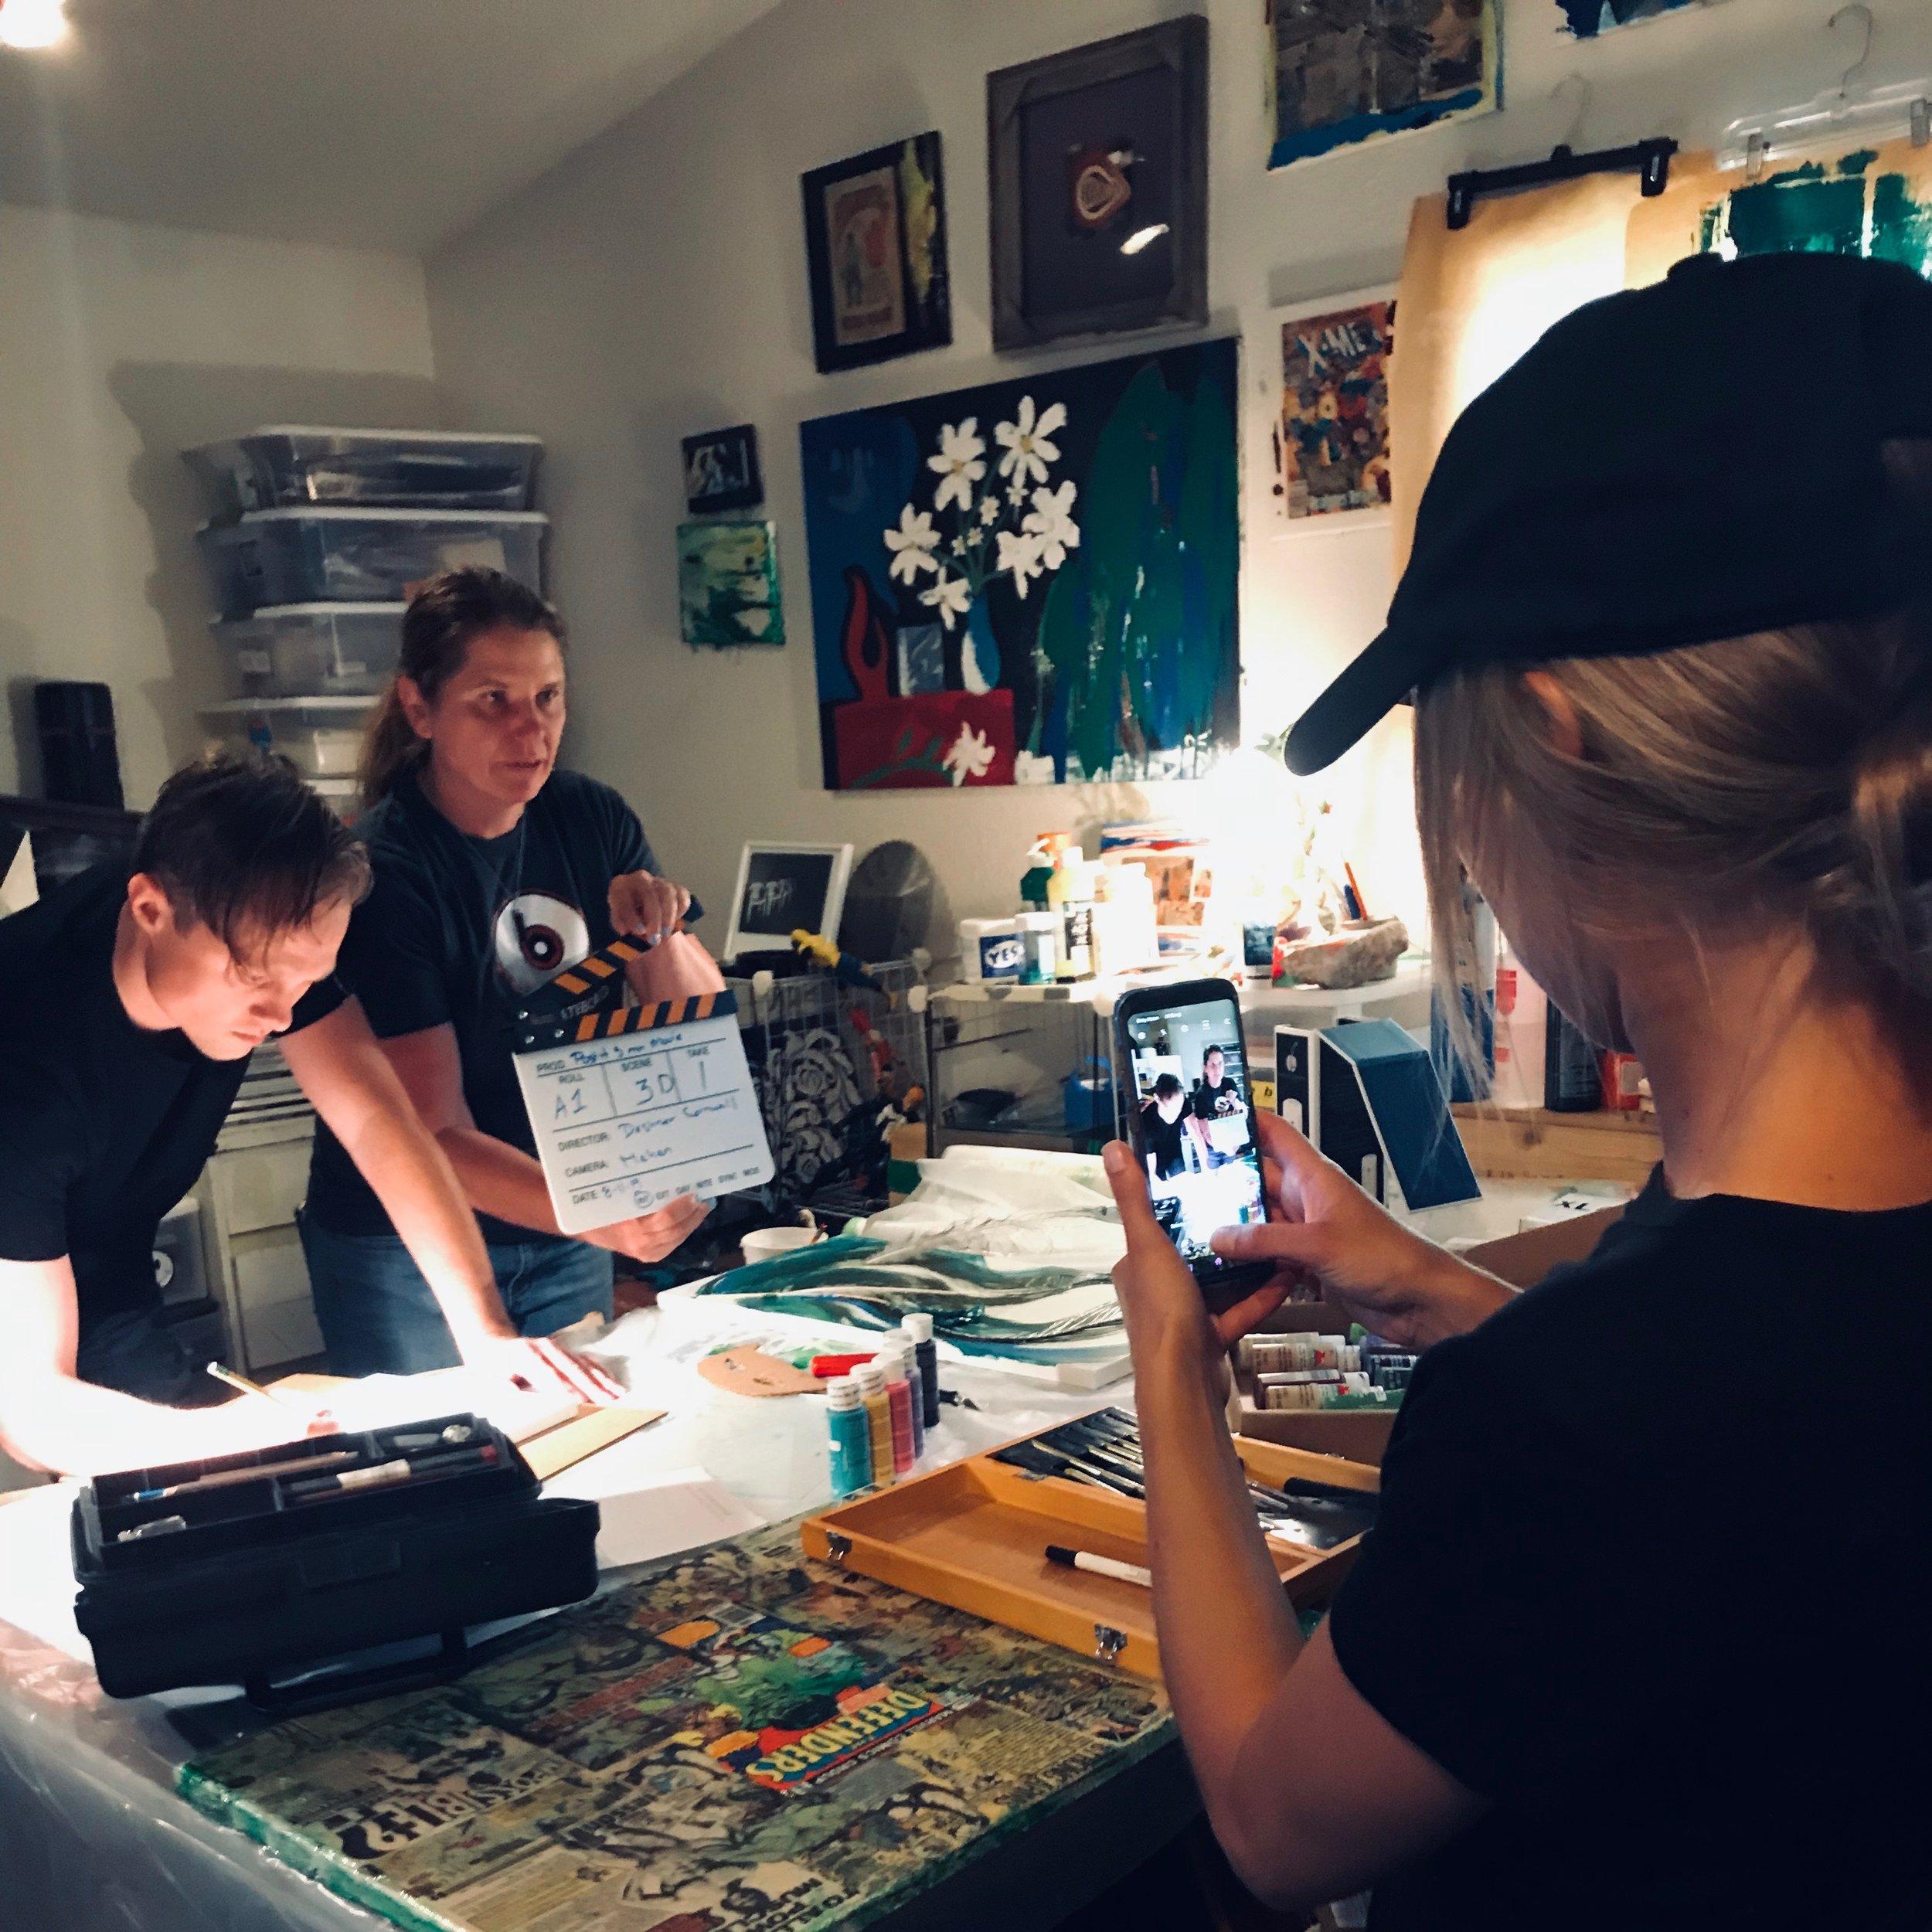 On the set of Post iT: Episode 2. From left to right - Austin Von Johnson, Erica Deshner Cornwall, Christina Lane Hawkins